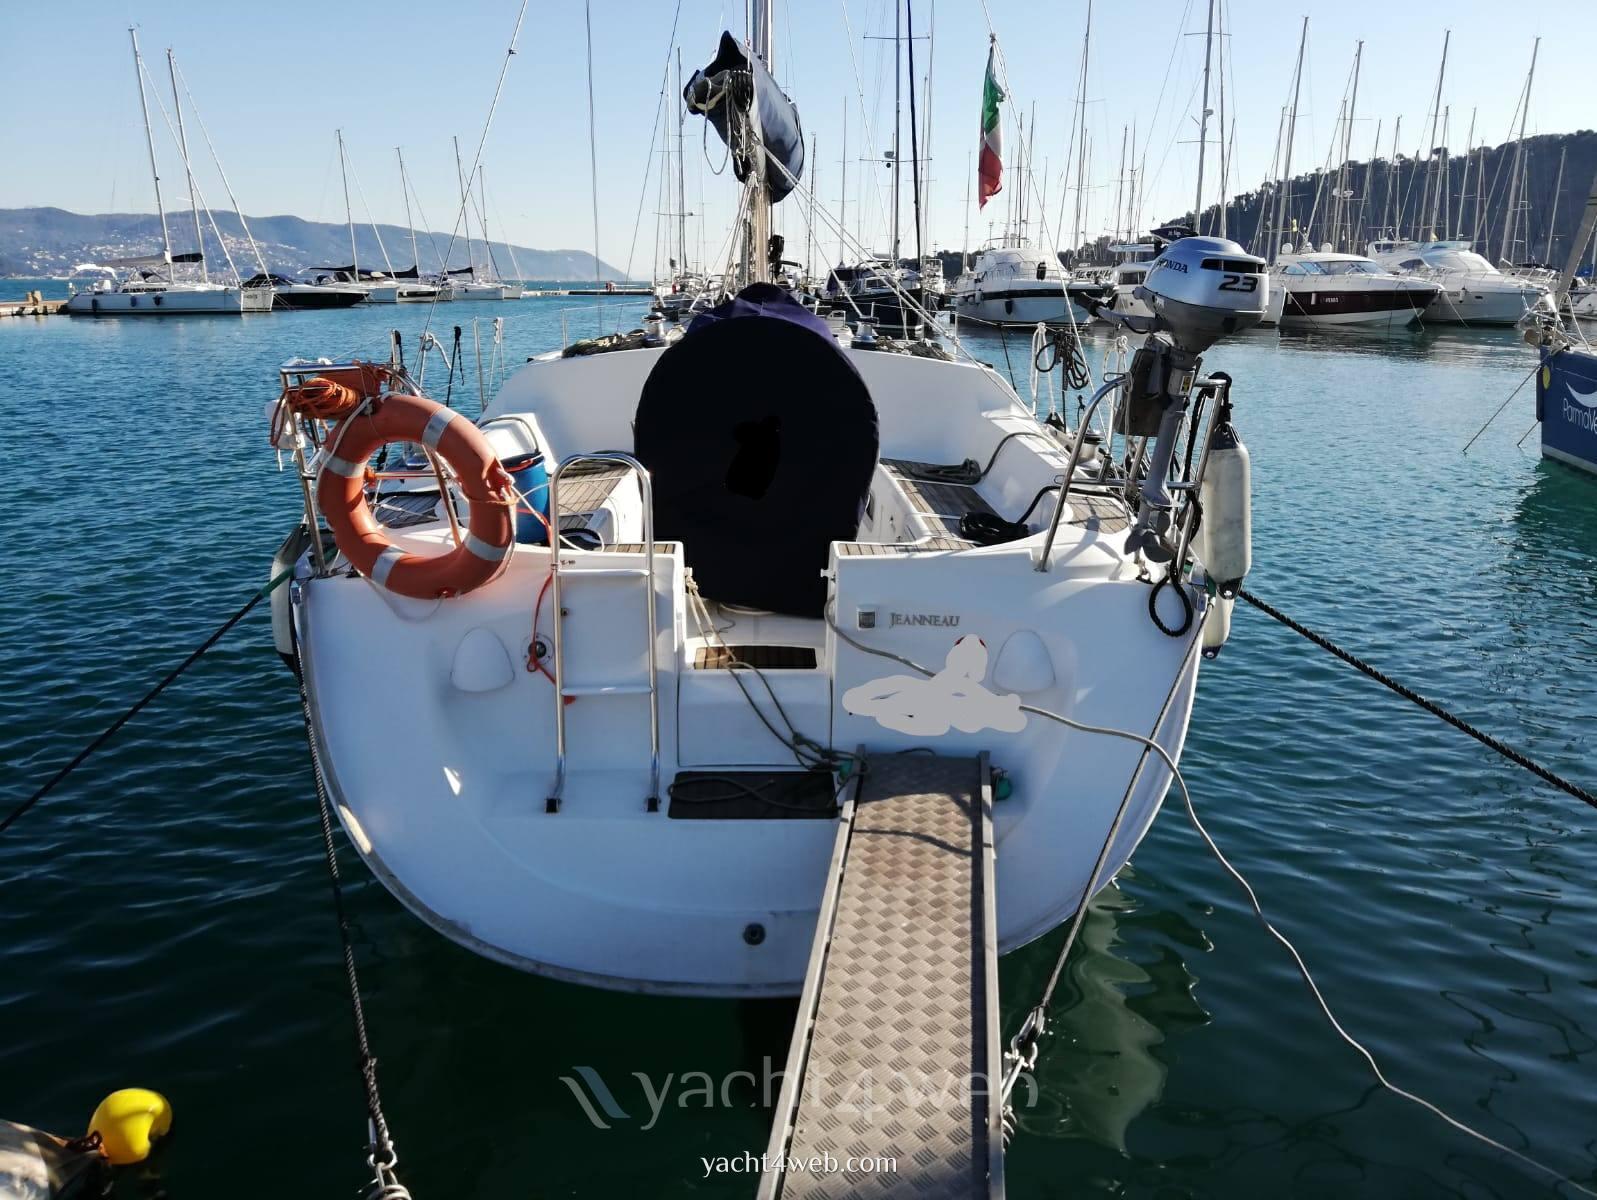 Jeanneau Sun odyssey 37 Sailing boat used for sale